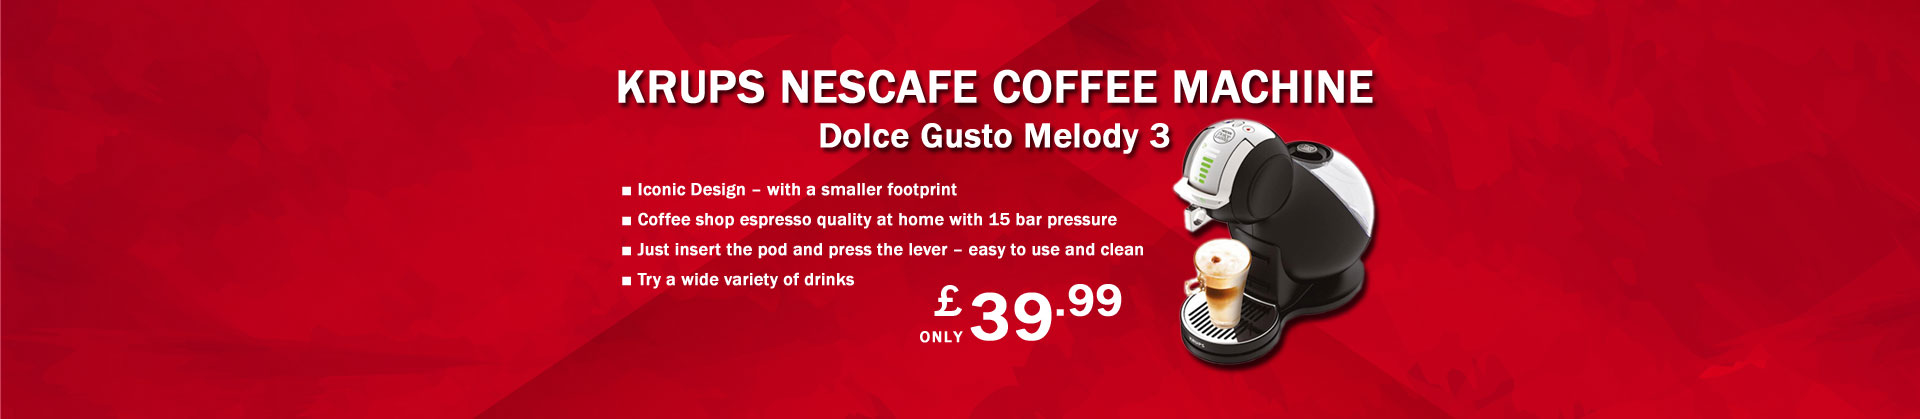 Krups KP230840 Nescafe Coffee Pod Machine only £39.99